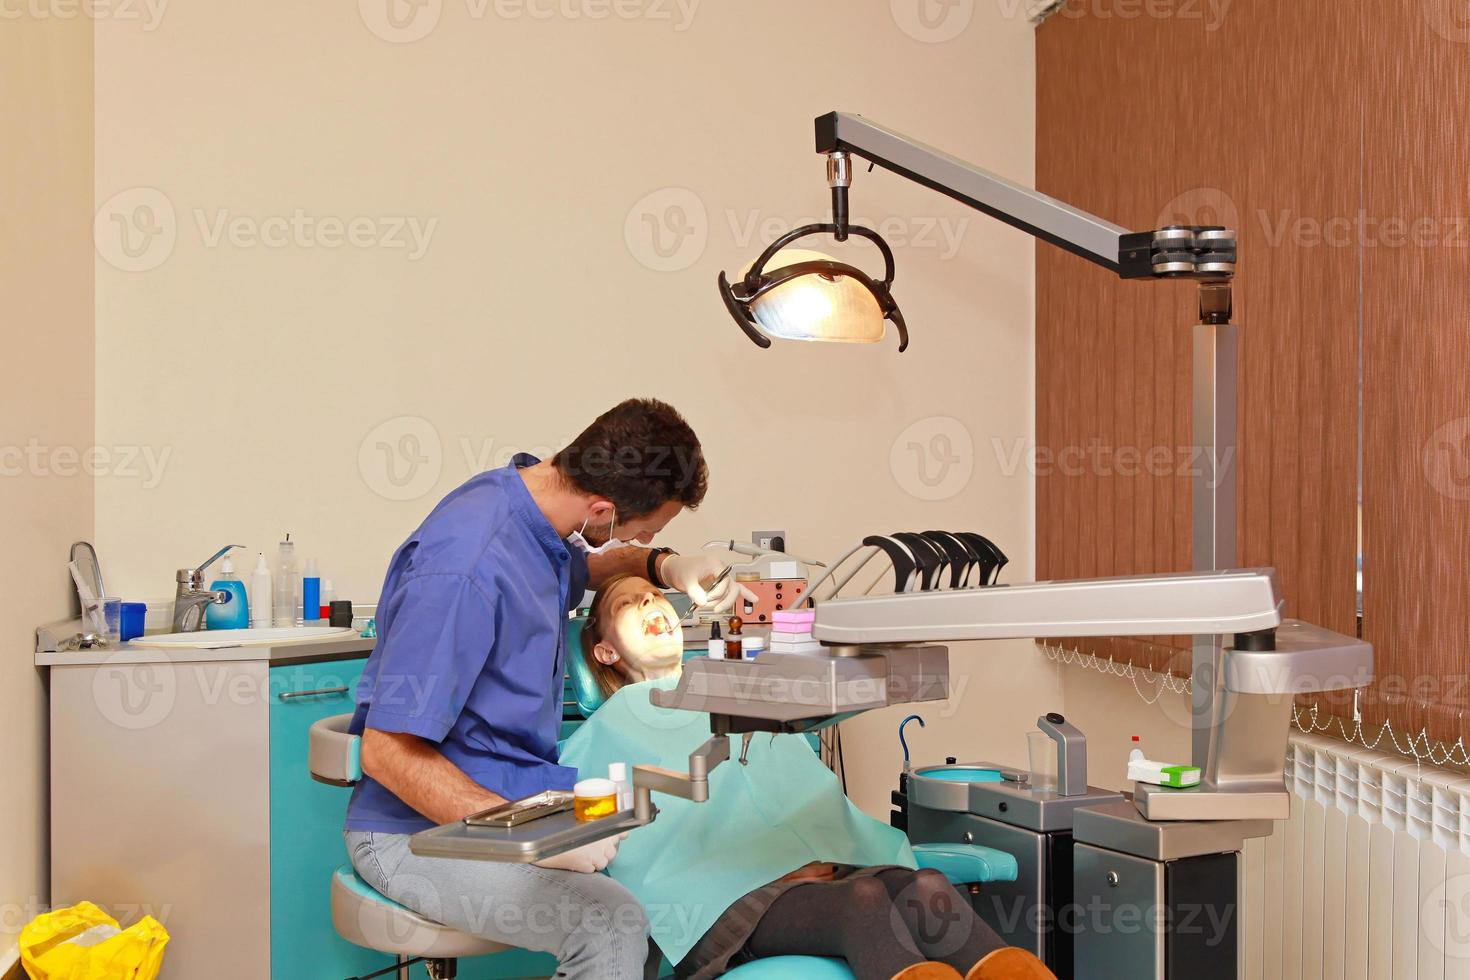 bureau de dentiste photo